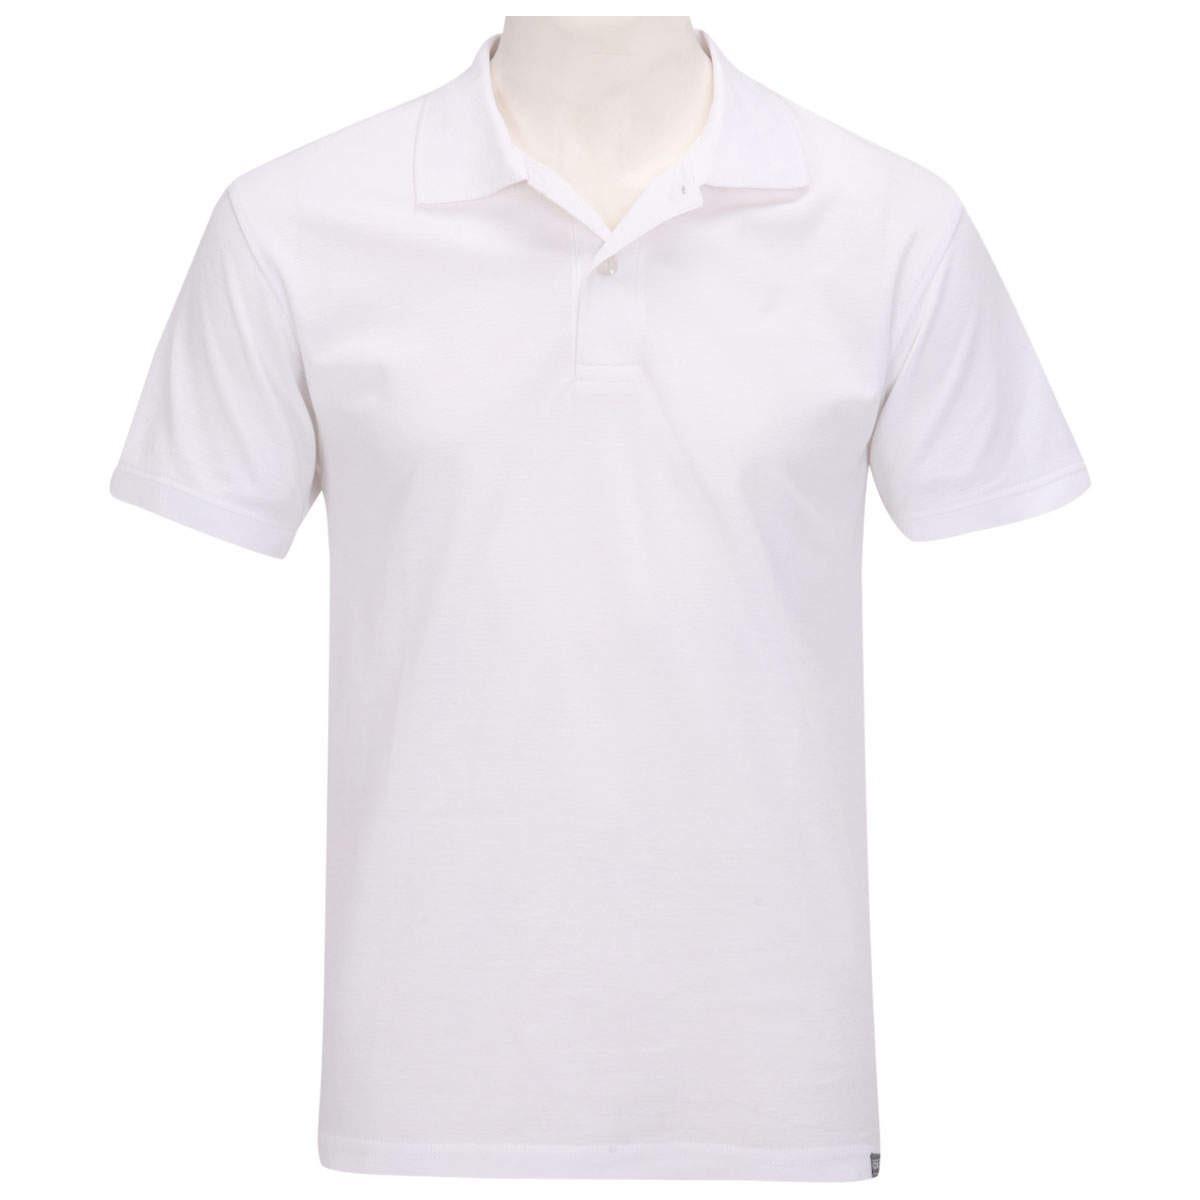 4c5d2afc19 blusa camisa polo oxer basic west masculina branca tam. p. Carregando zoom.